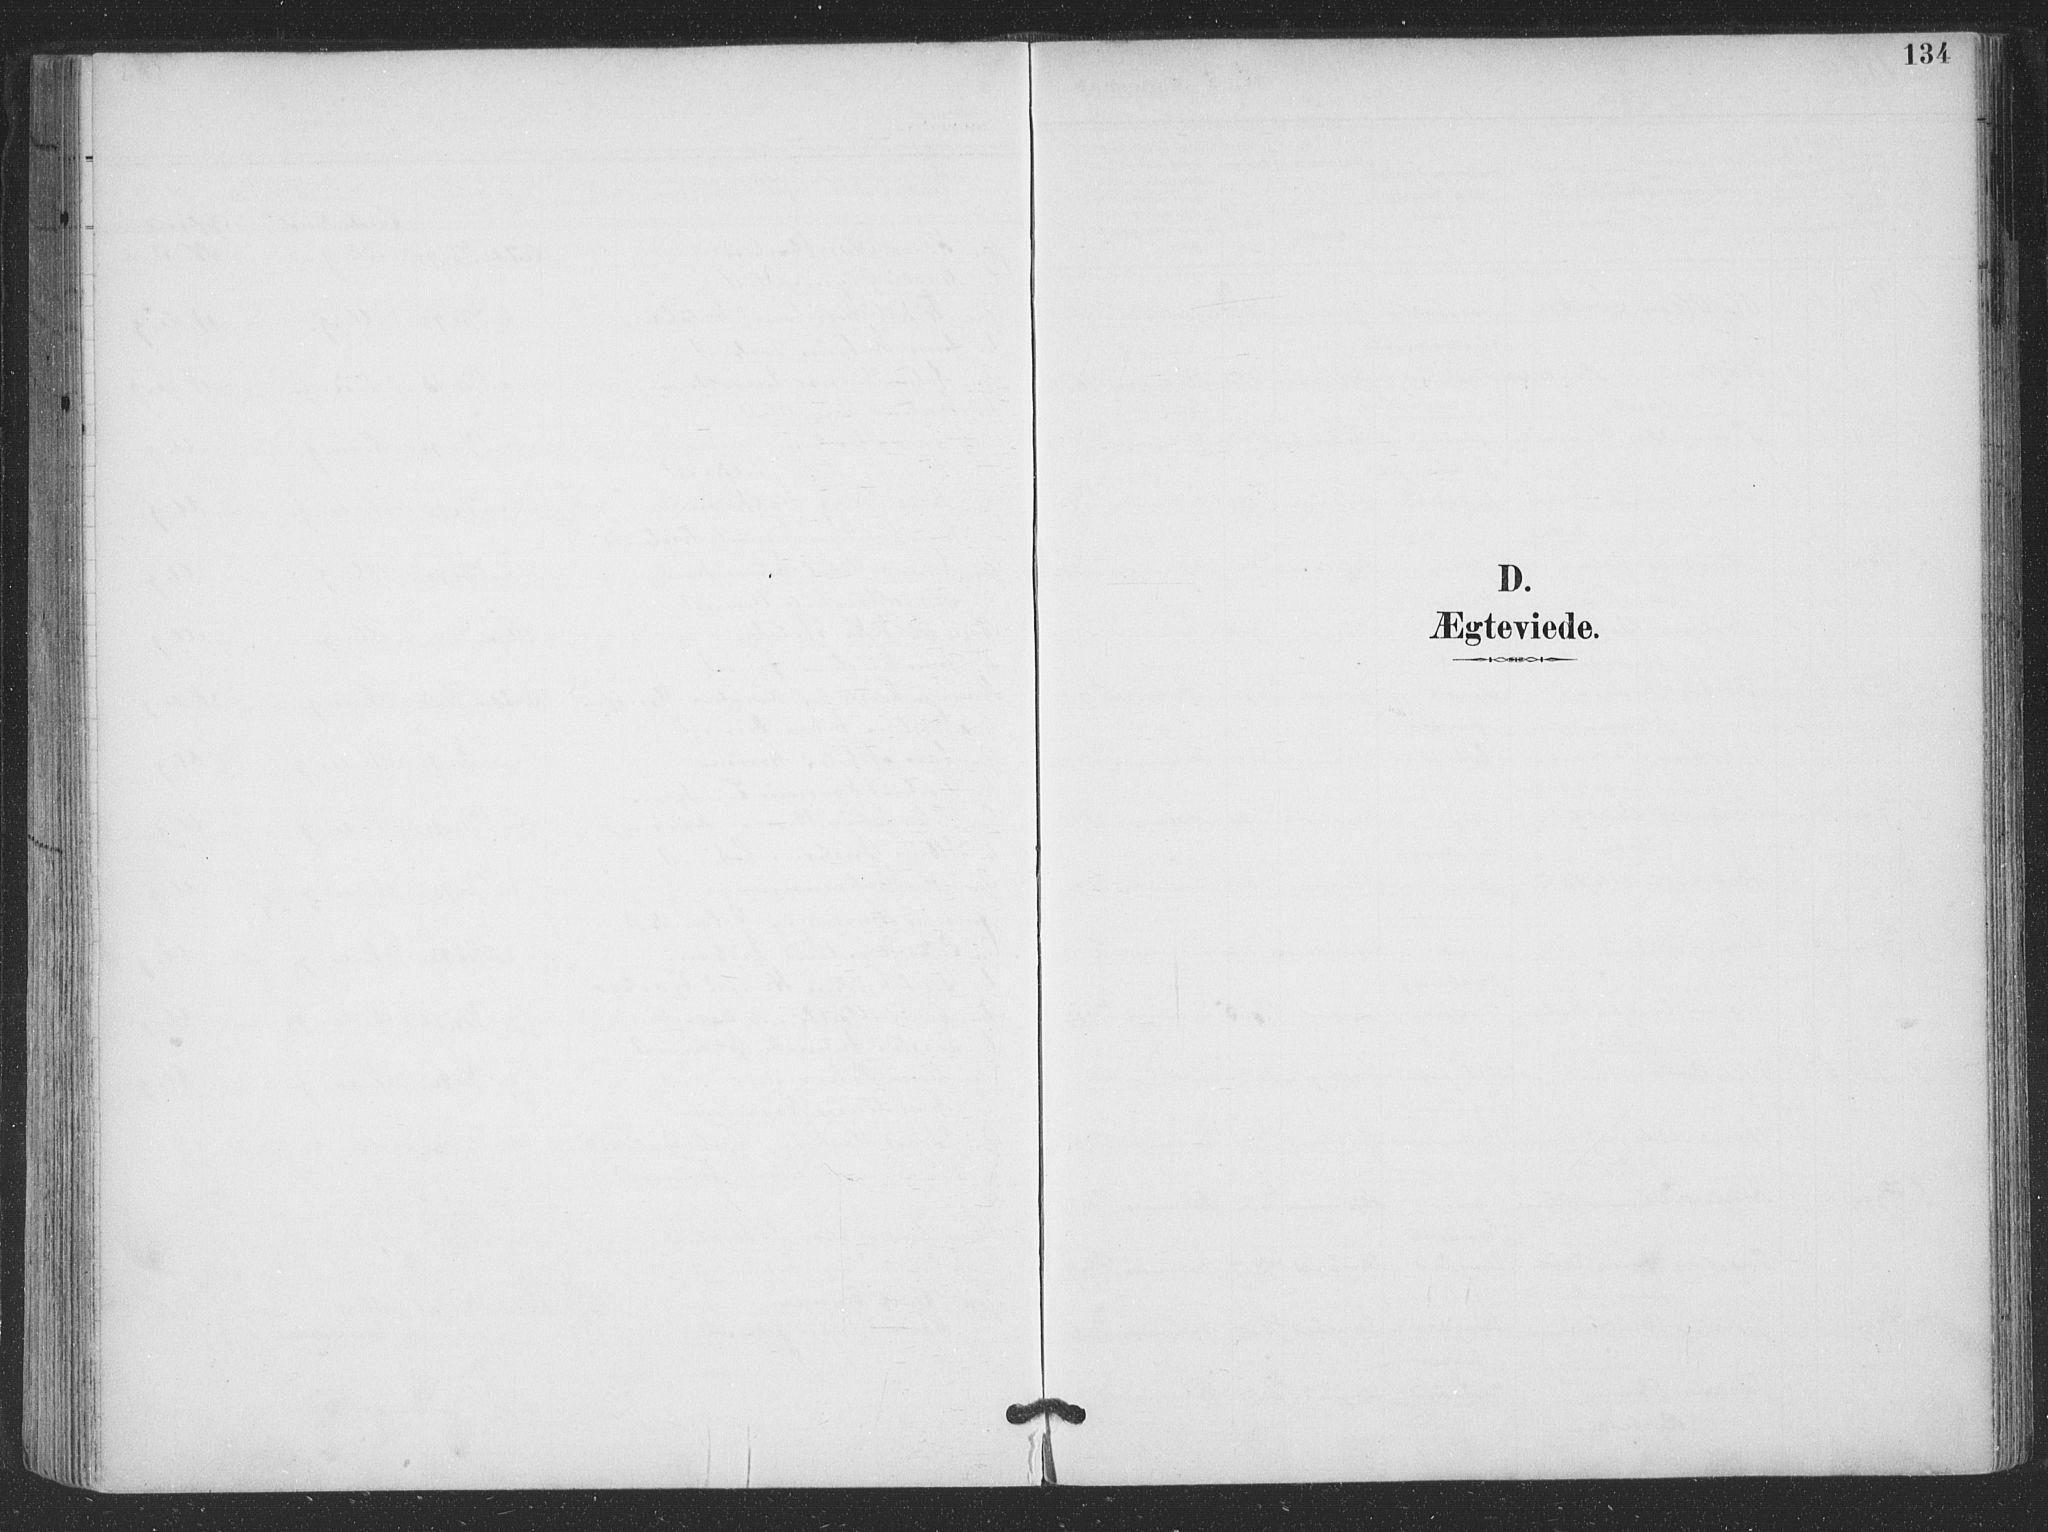 SAT, Ministerialprotokoller, klokkerbøker og fødselsregistre - Nordland, 866/L0939: Ministerialbok nr. 866A02, 1894-1906, s. 134